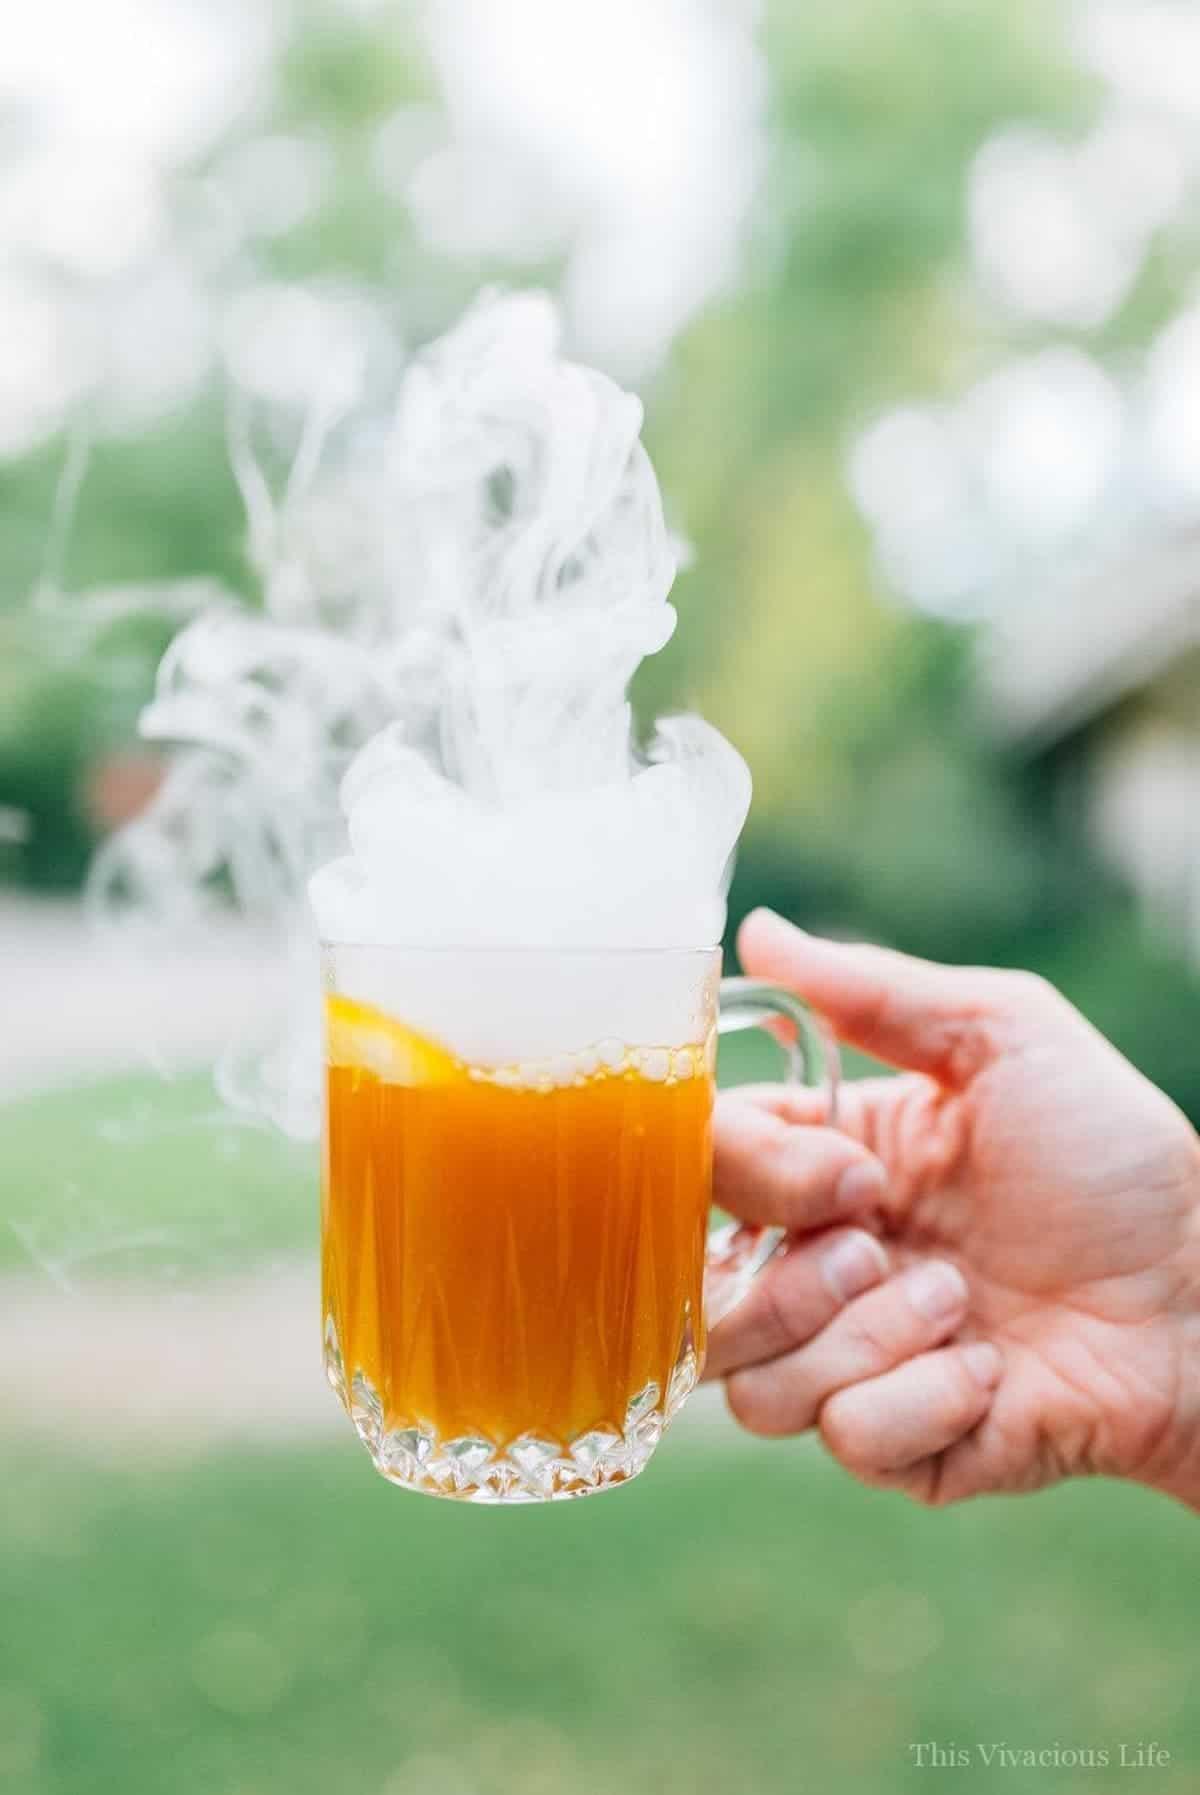 Pumpkin punch in a hand smoking